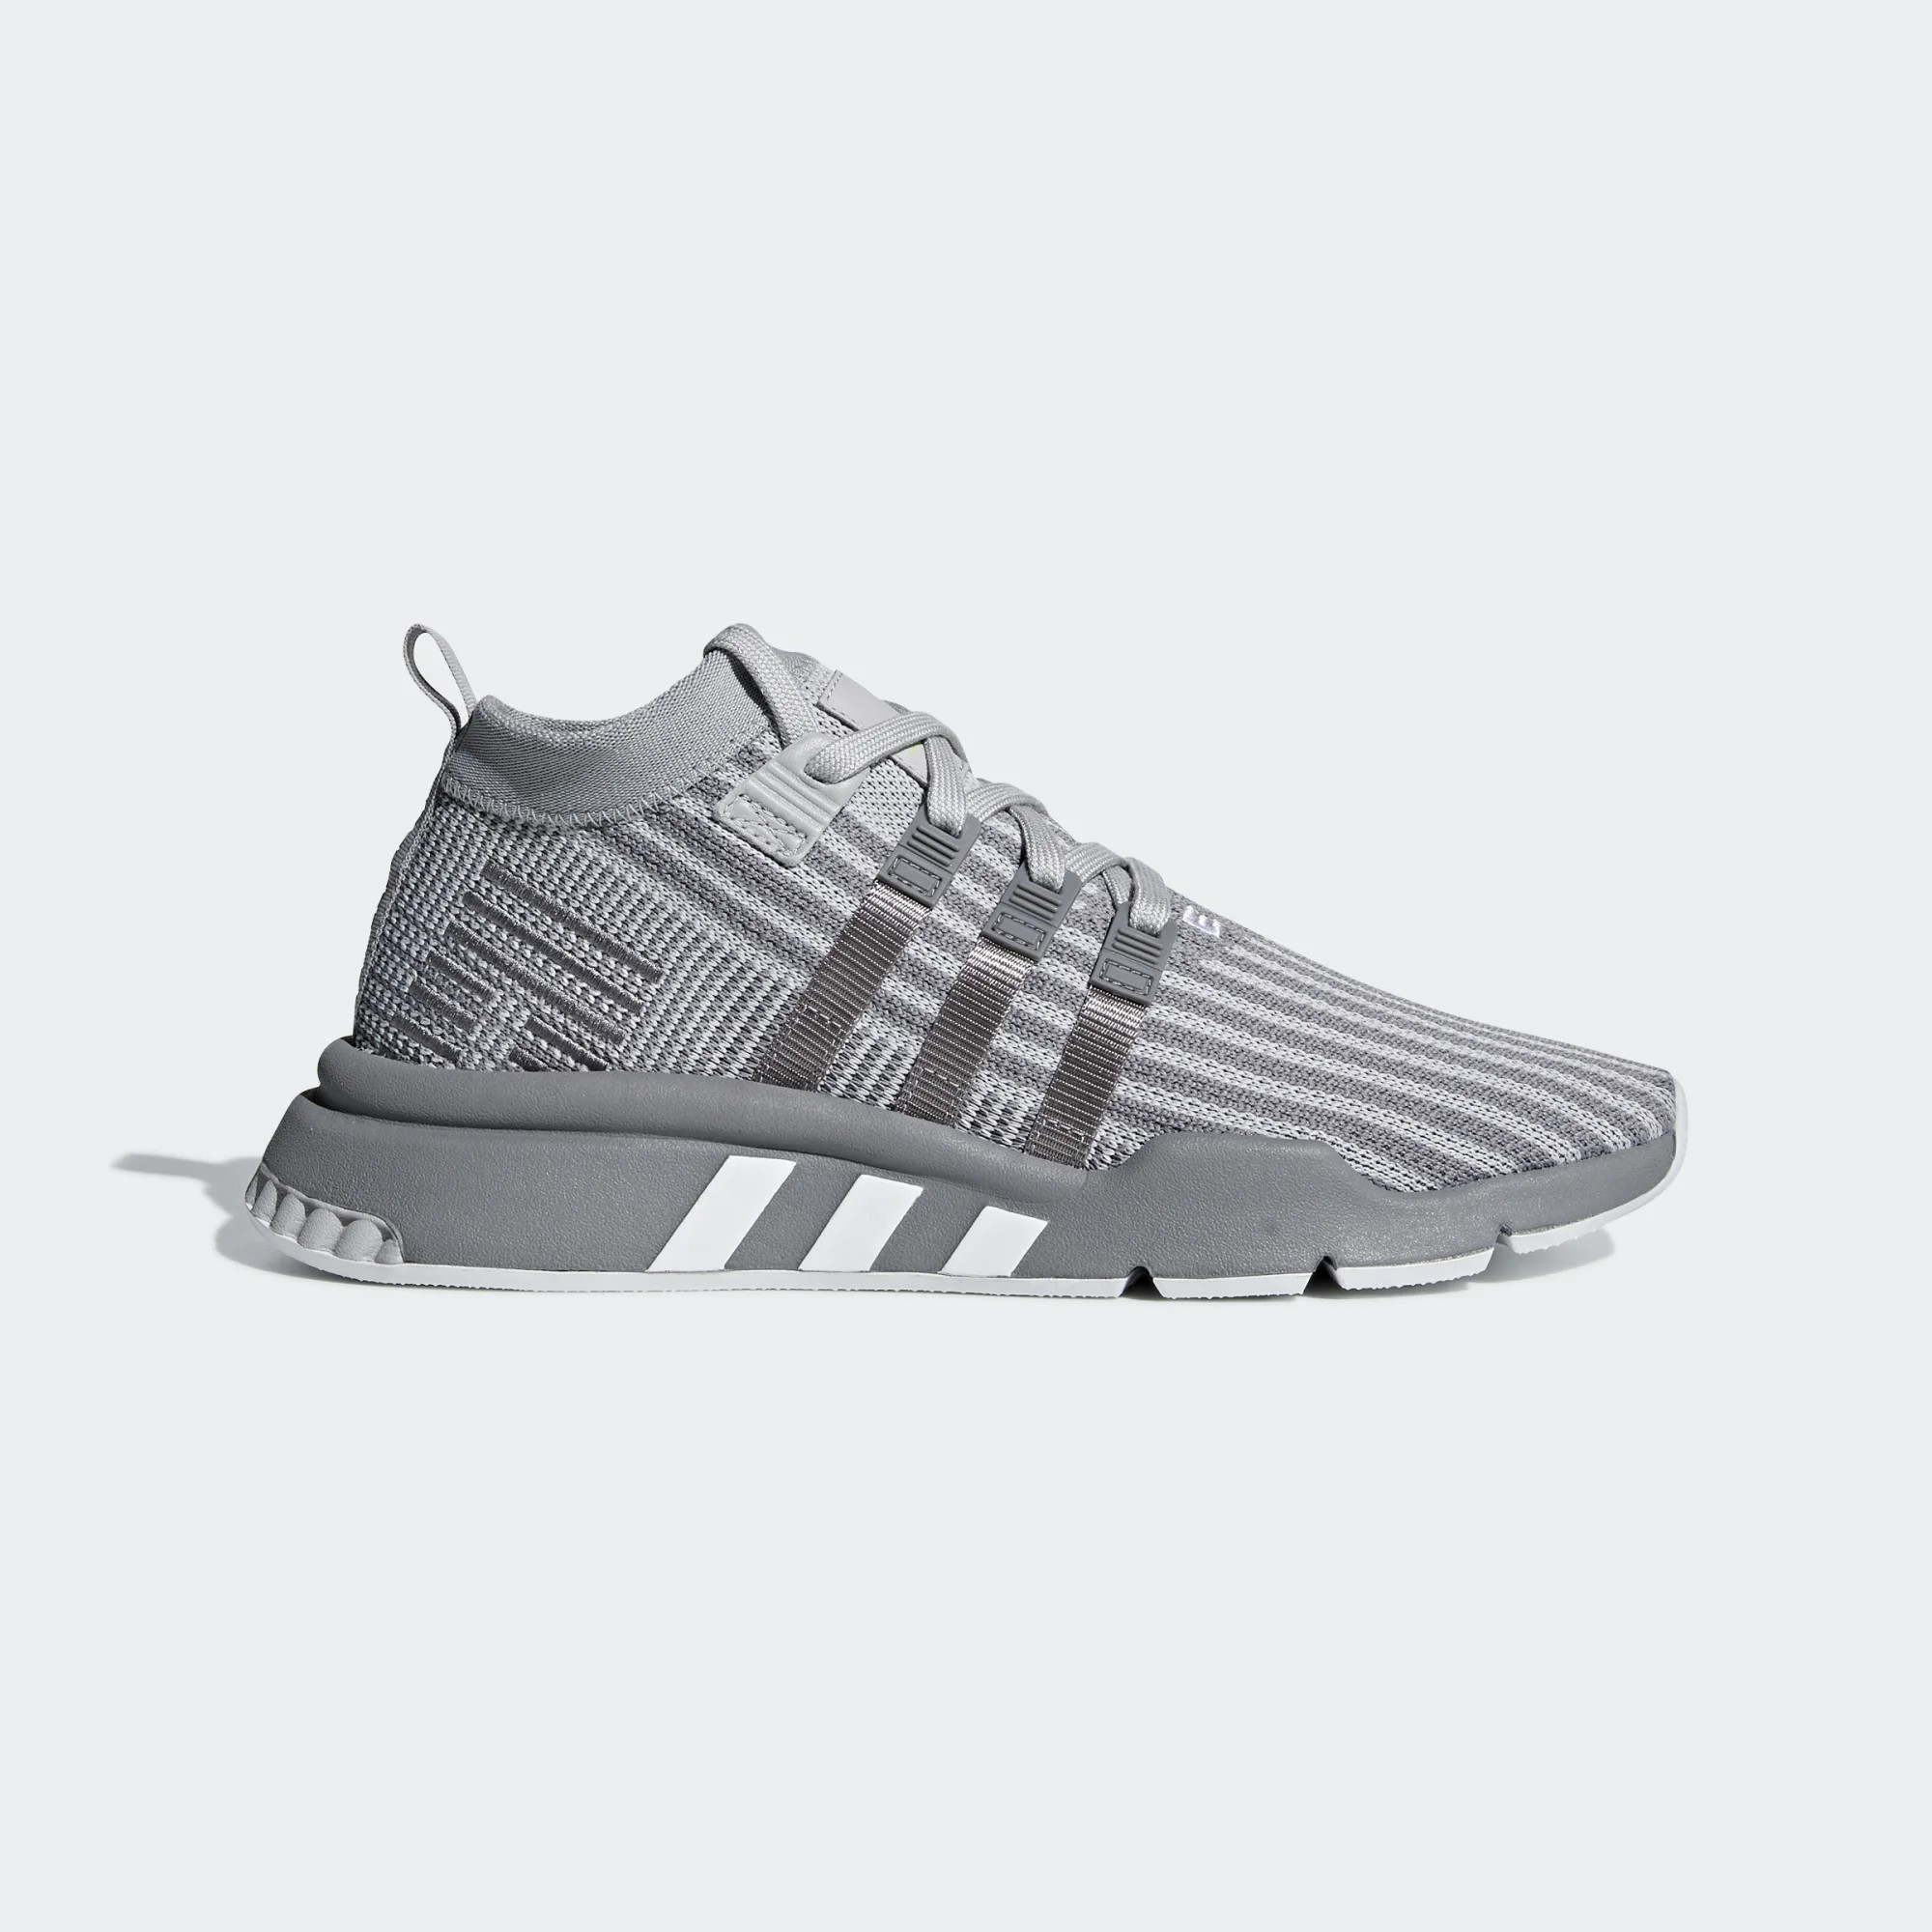 Adidas EQT Support Primeknit - GeTheMall